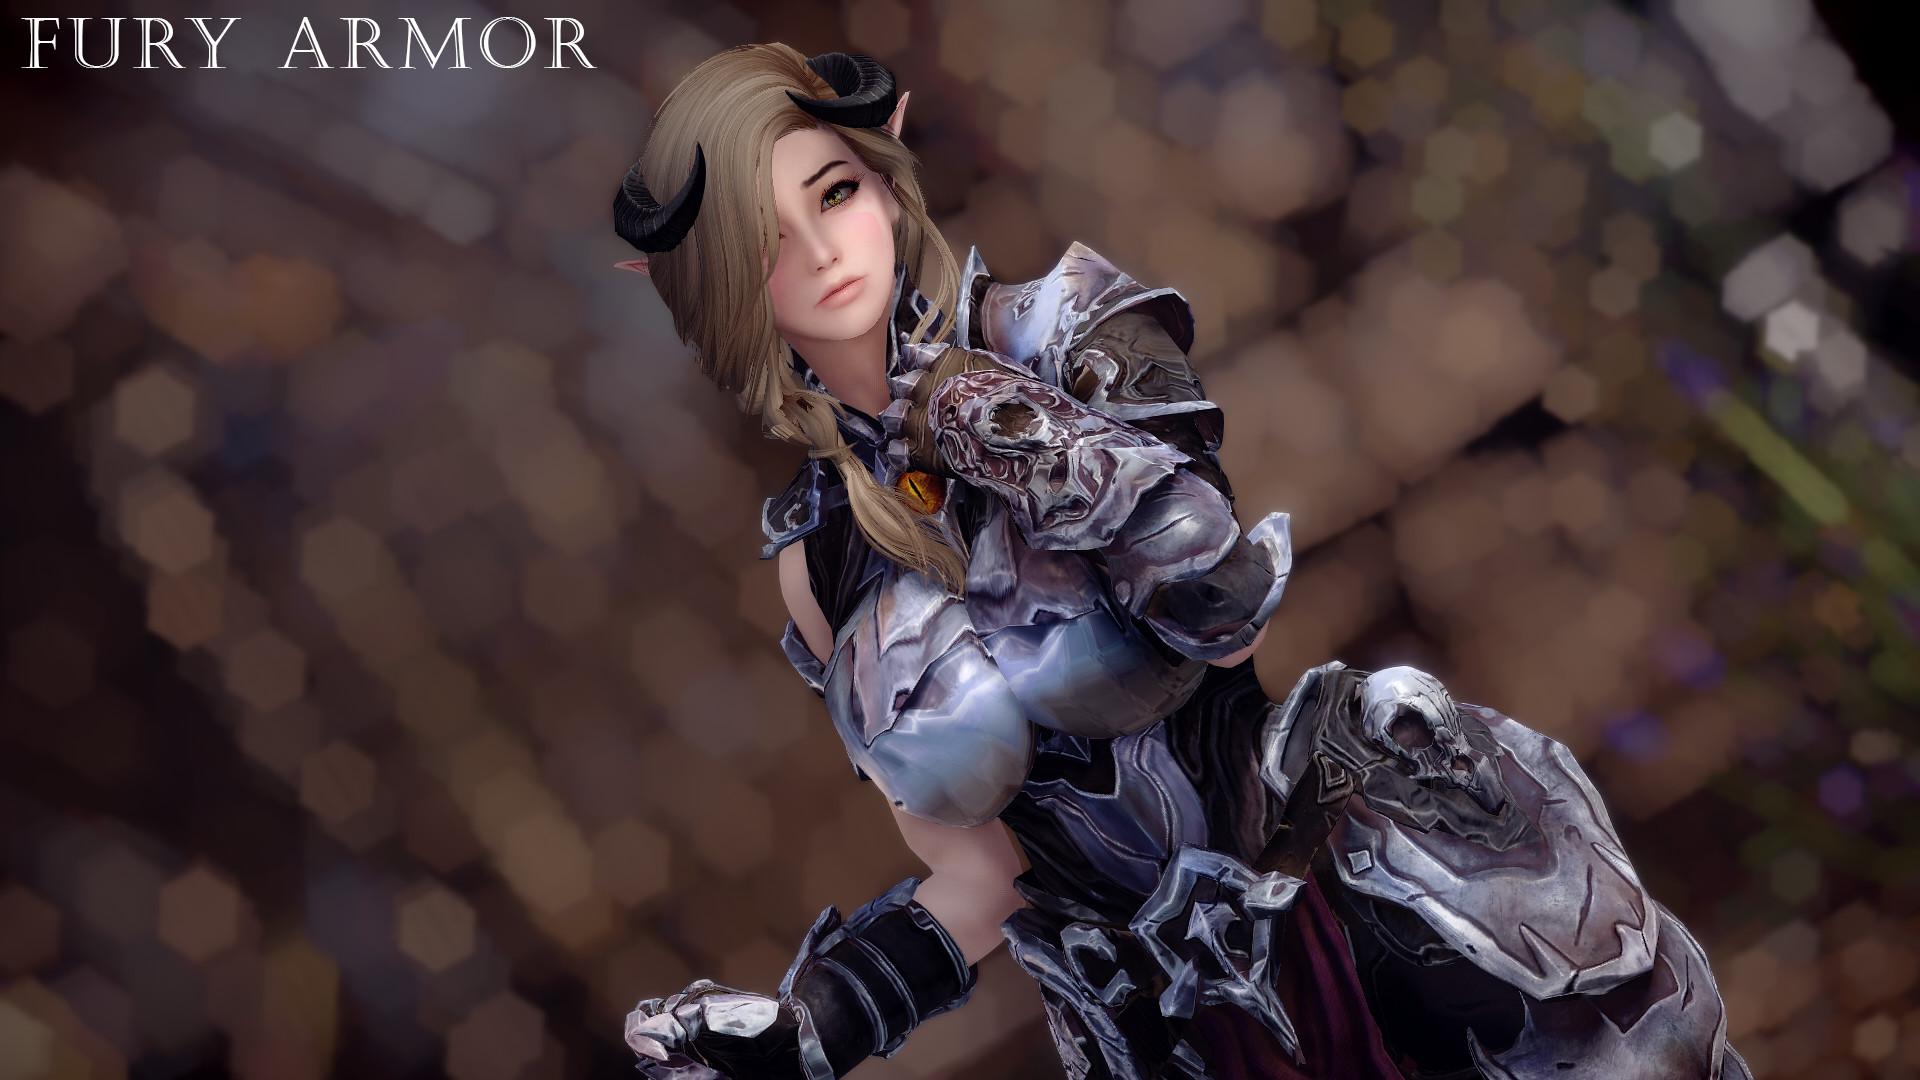 Fury Armor